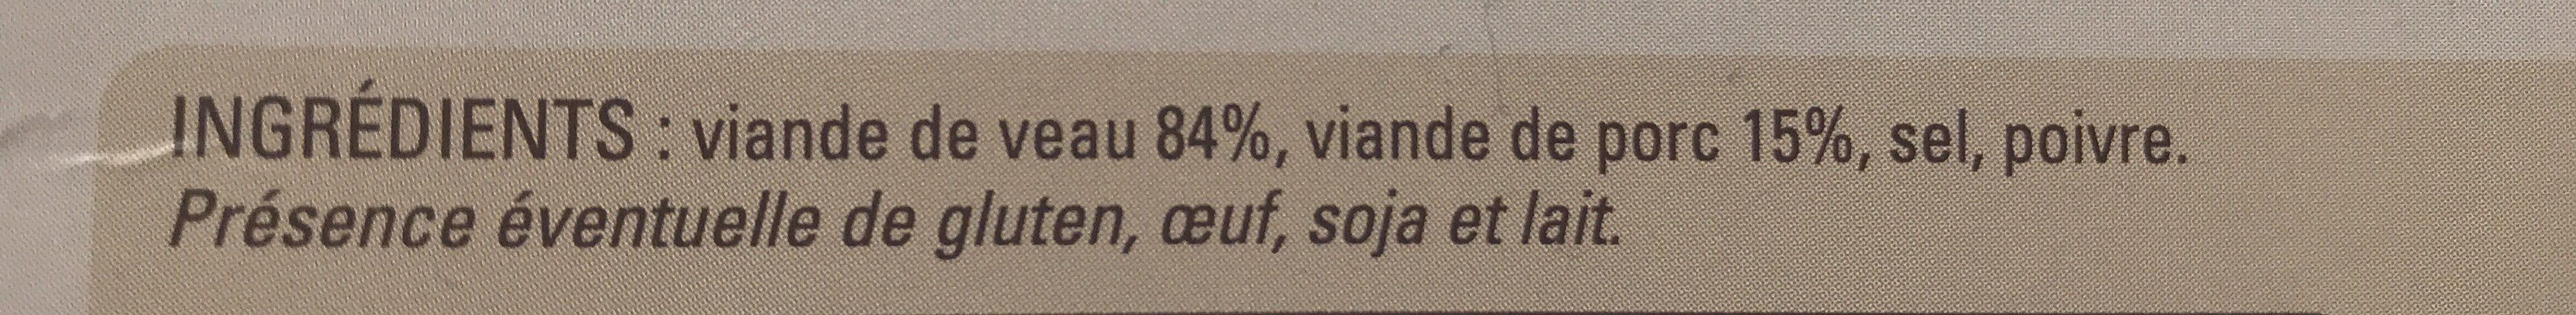 8 paupiettes de veau - Ingrediënten - fr